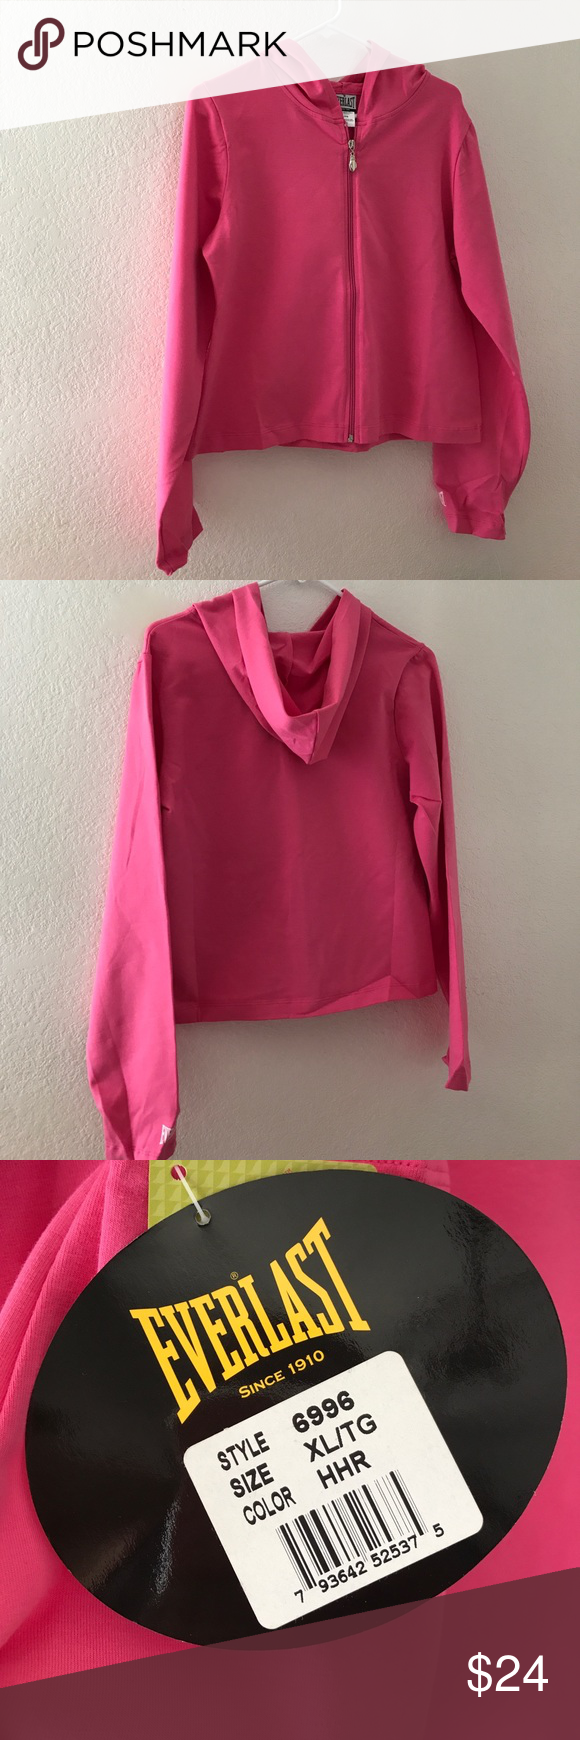 Everlast lightweight sweater NWT | Zipper pulls, Gloves and Bodies